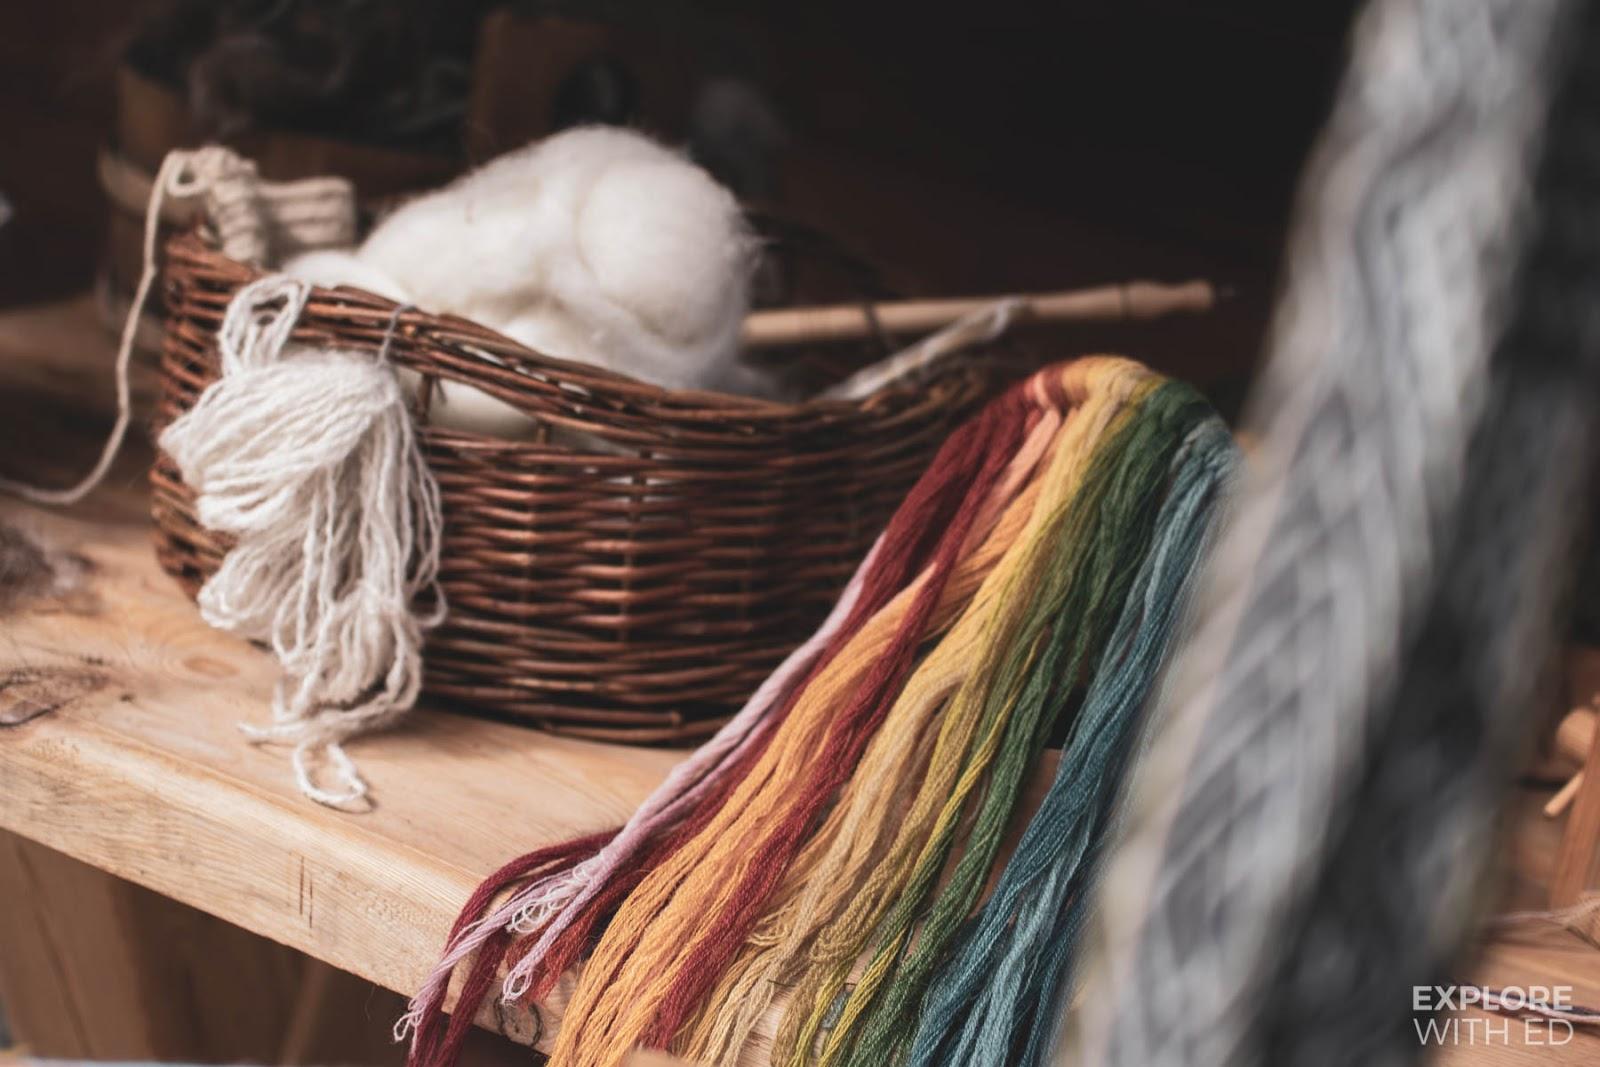 Textiles, clothing made in Njardarheimr Viking Valley